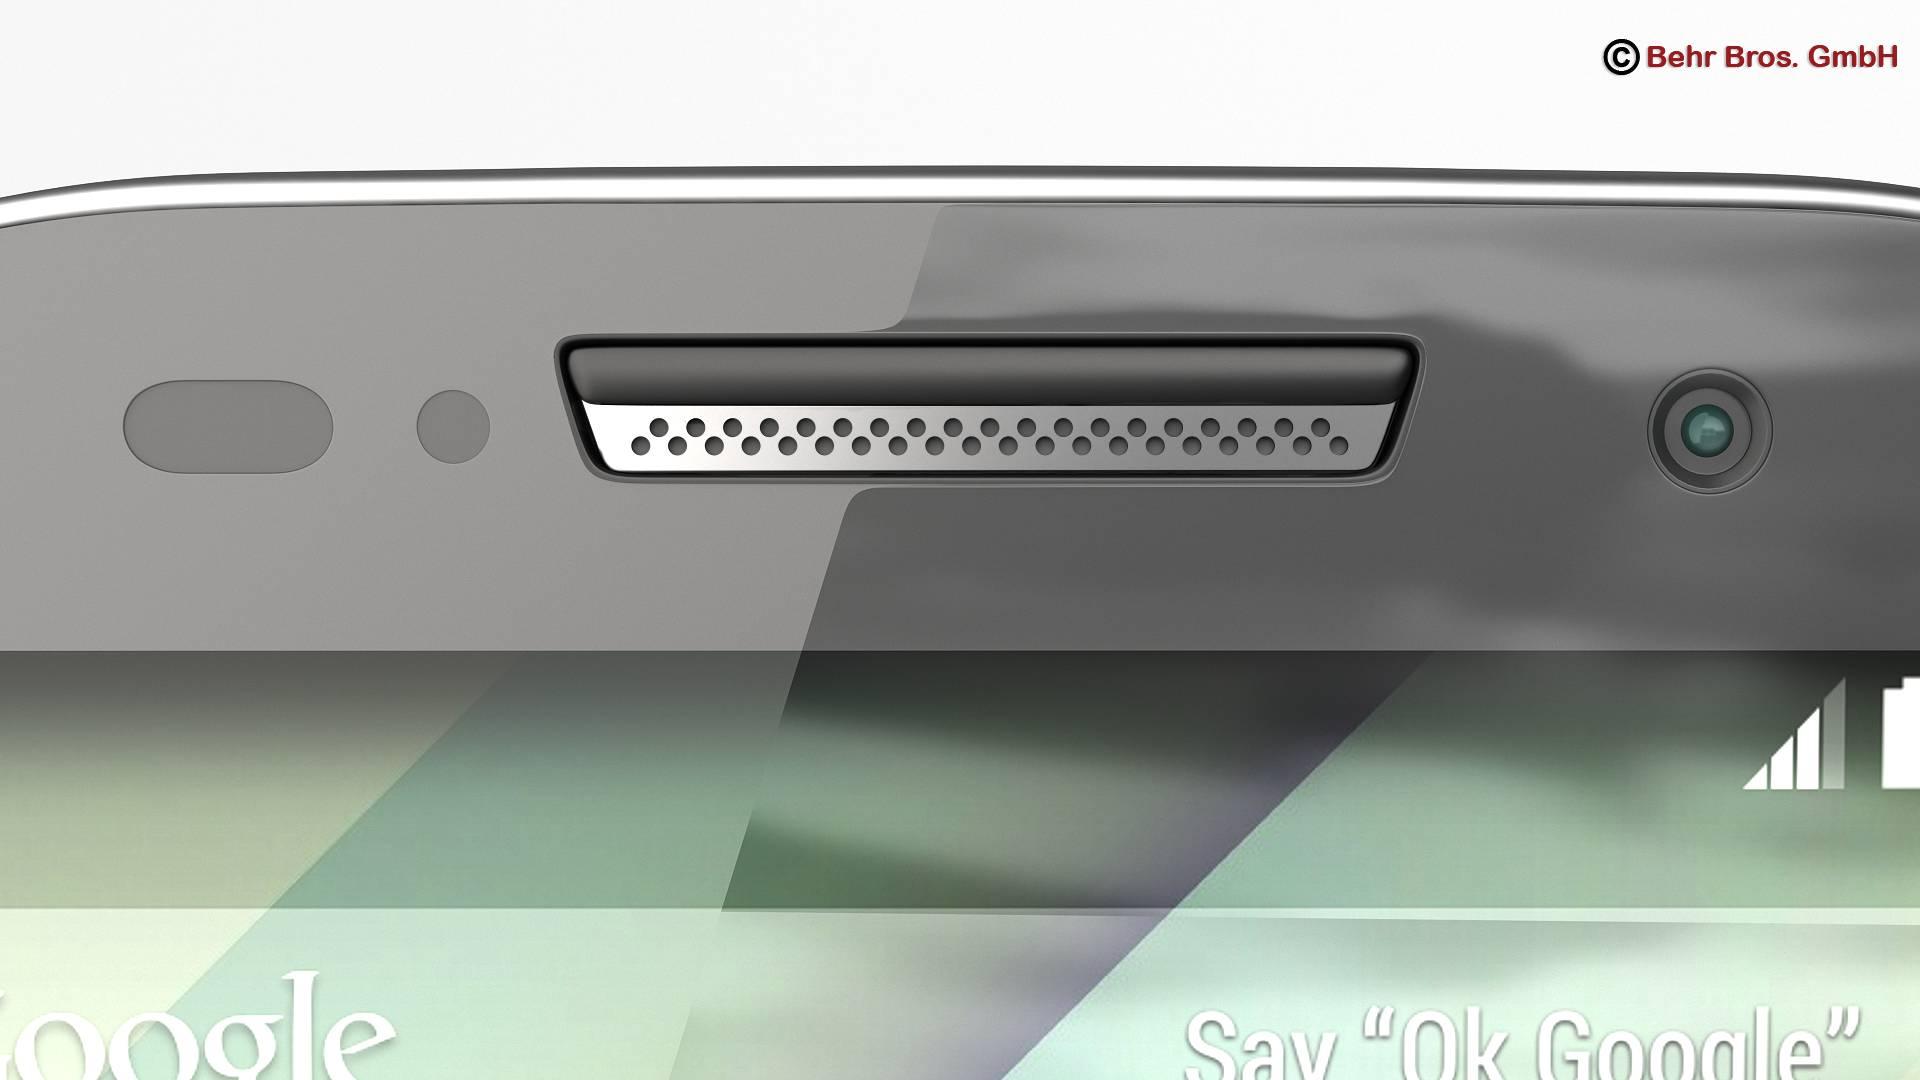 generic smartphone 4 inch 3d model 3ds max fbx c4d lwo ma mb obj 161631